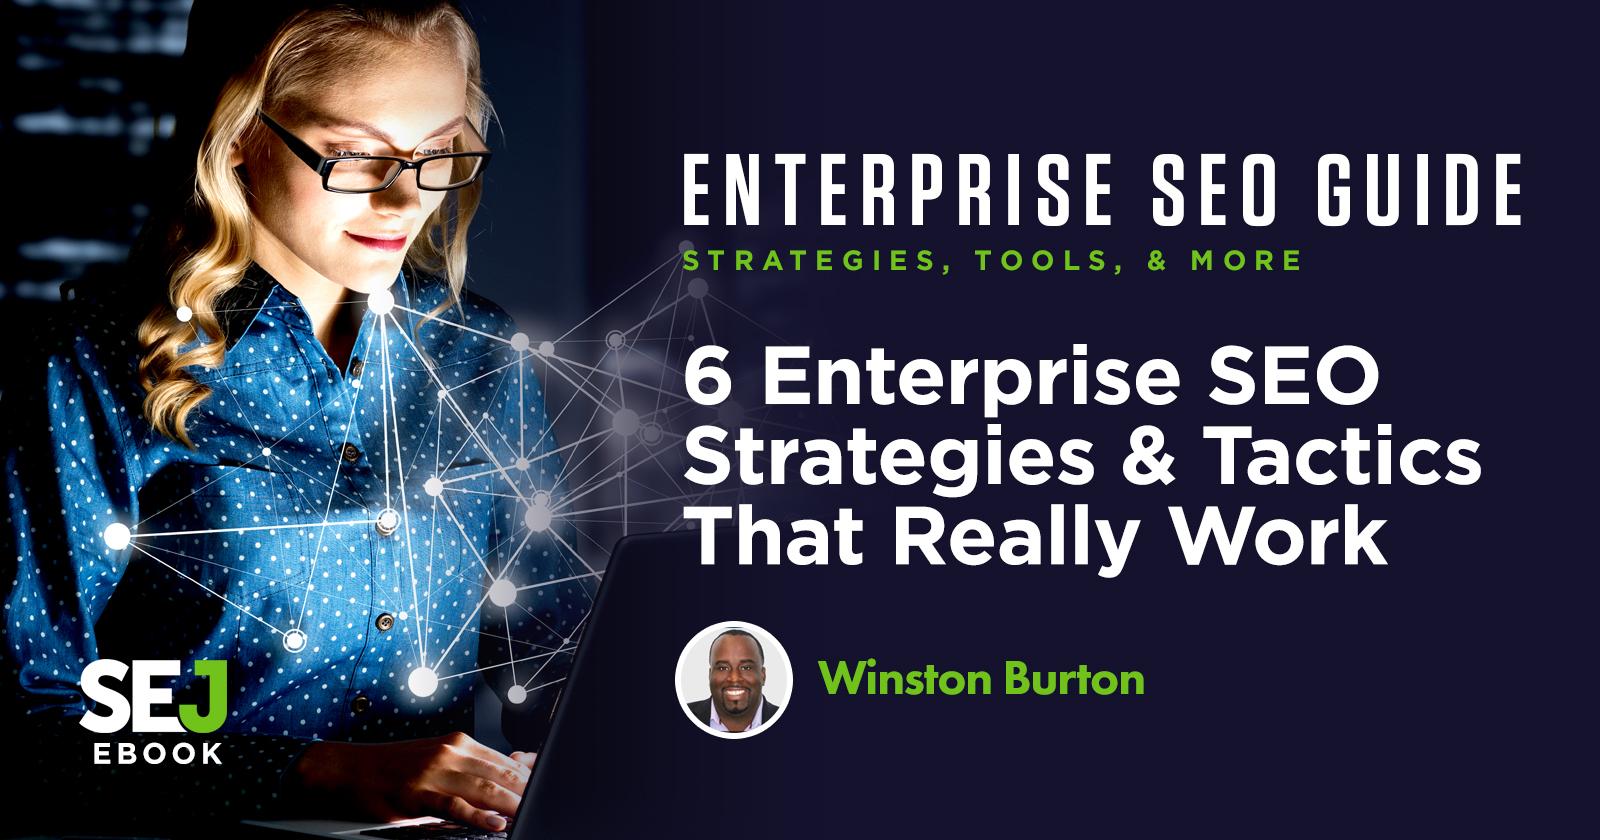 6 Enterprise SEO Strategies & Tactics That Really Work